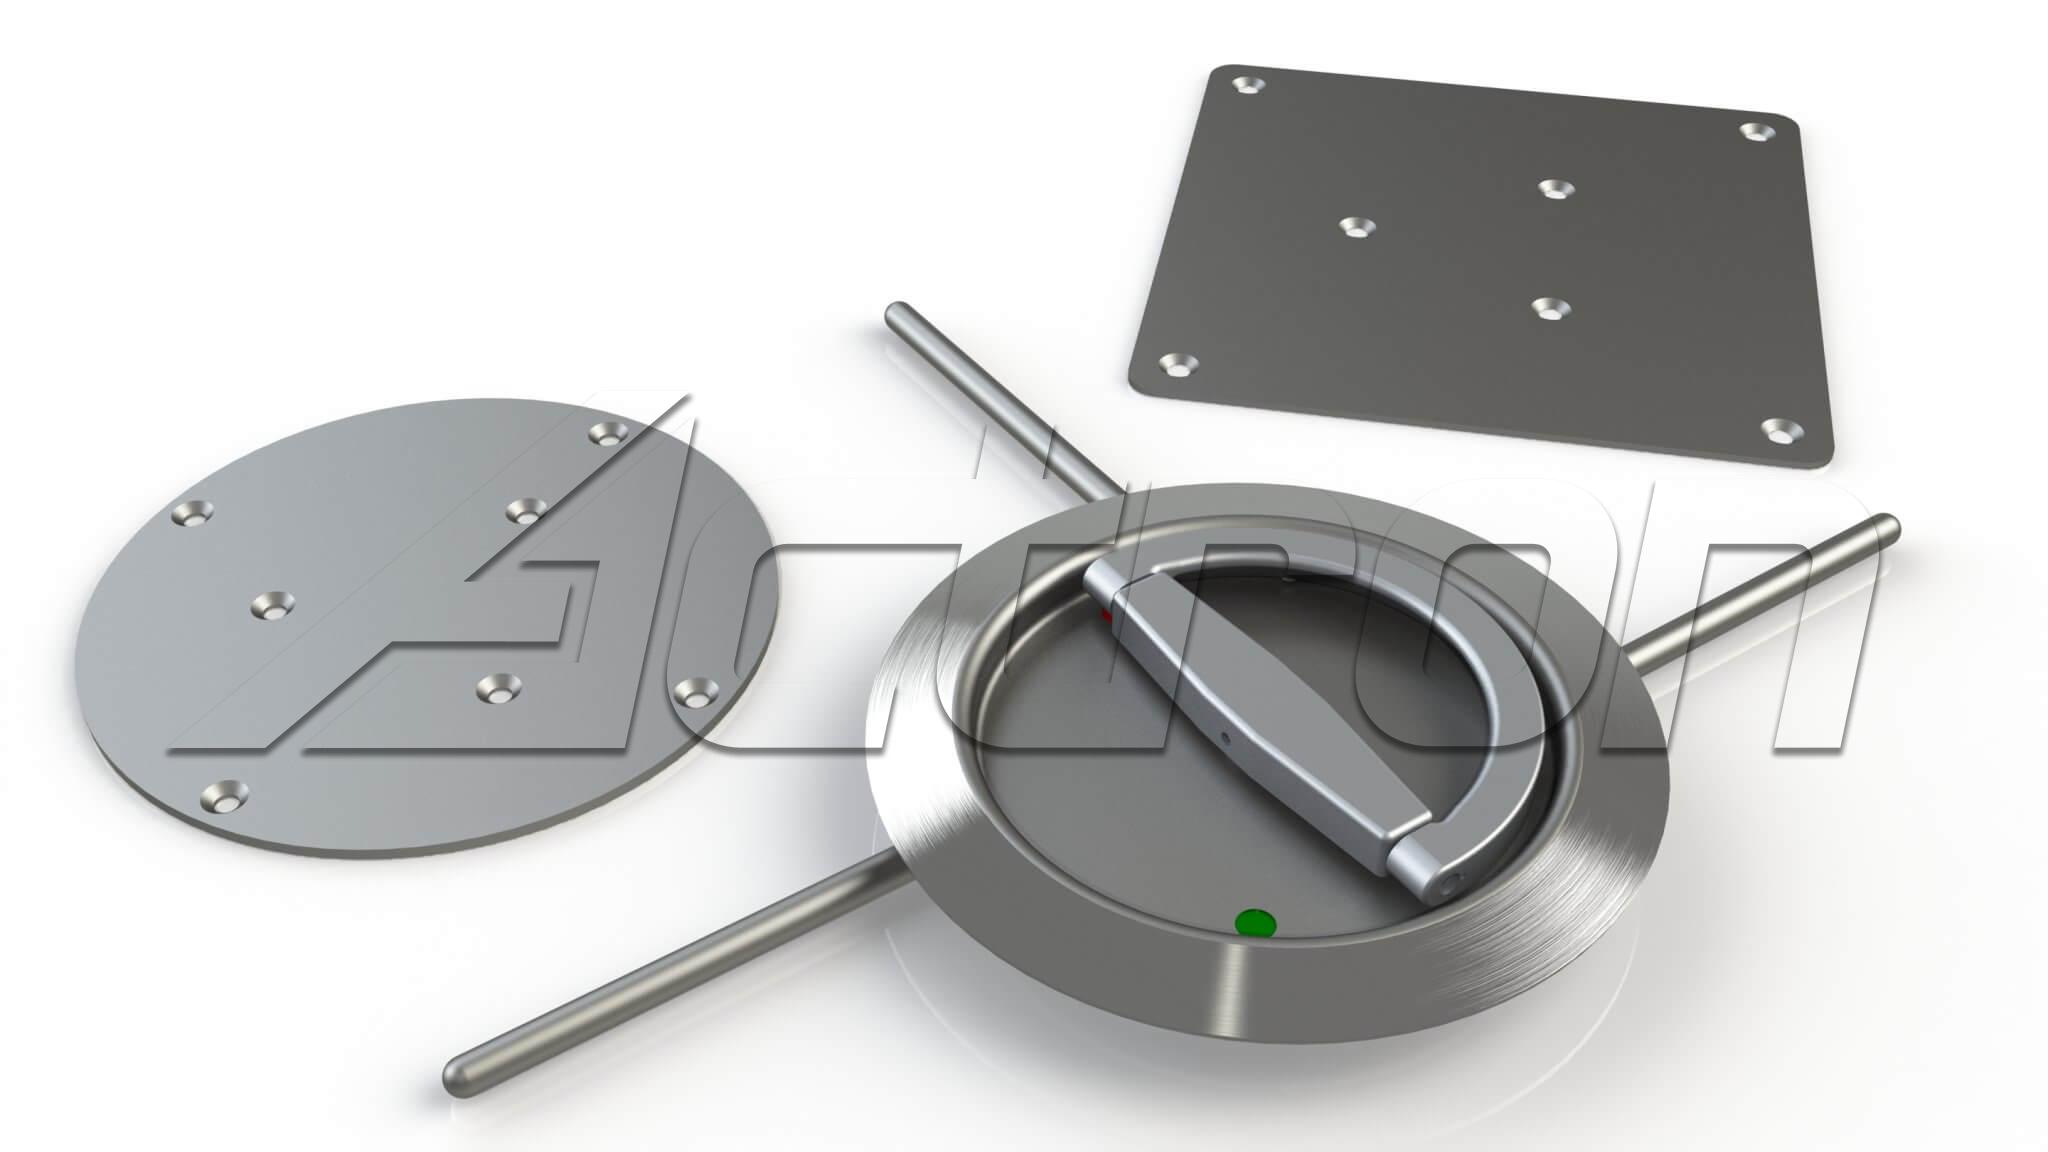 door-bolting-system-8211-d-handle-4583-a39109.jpg